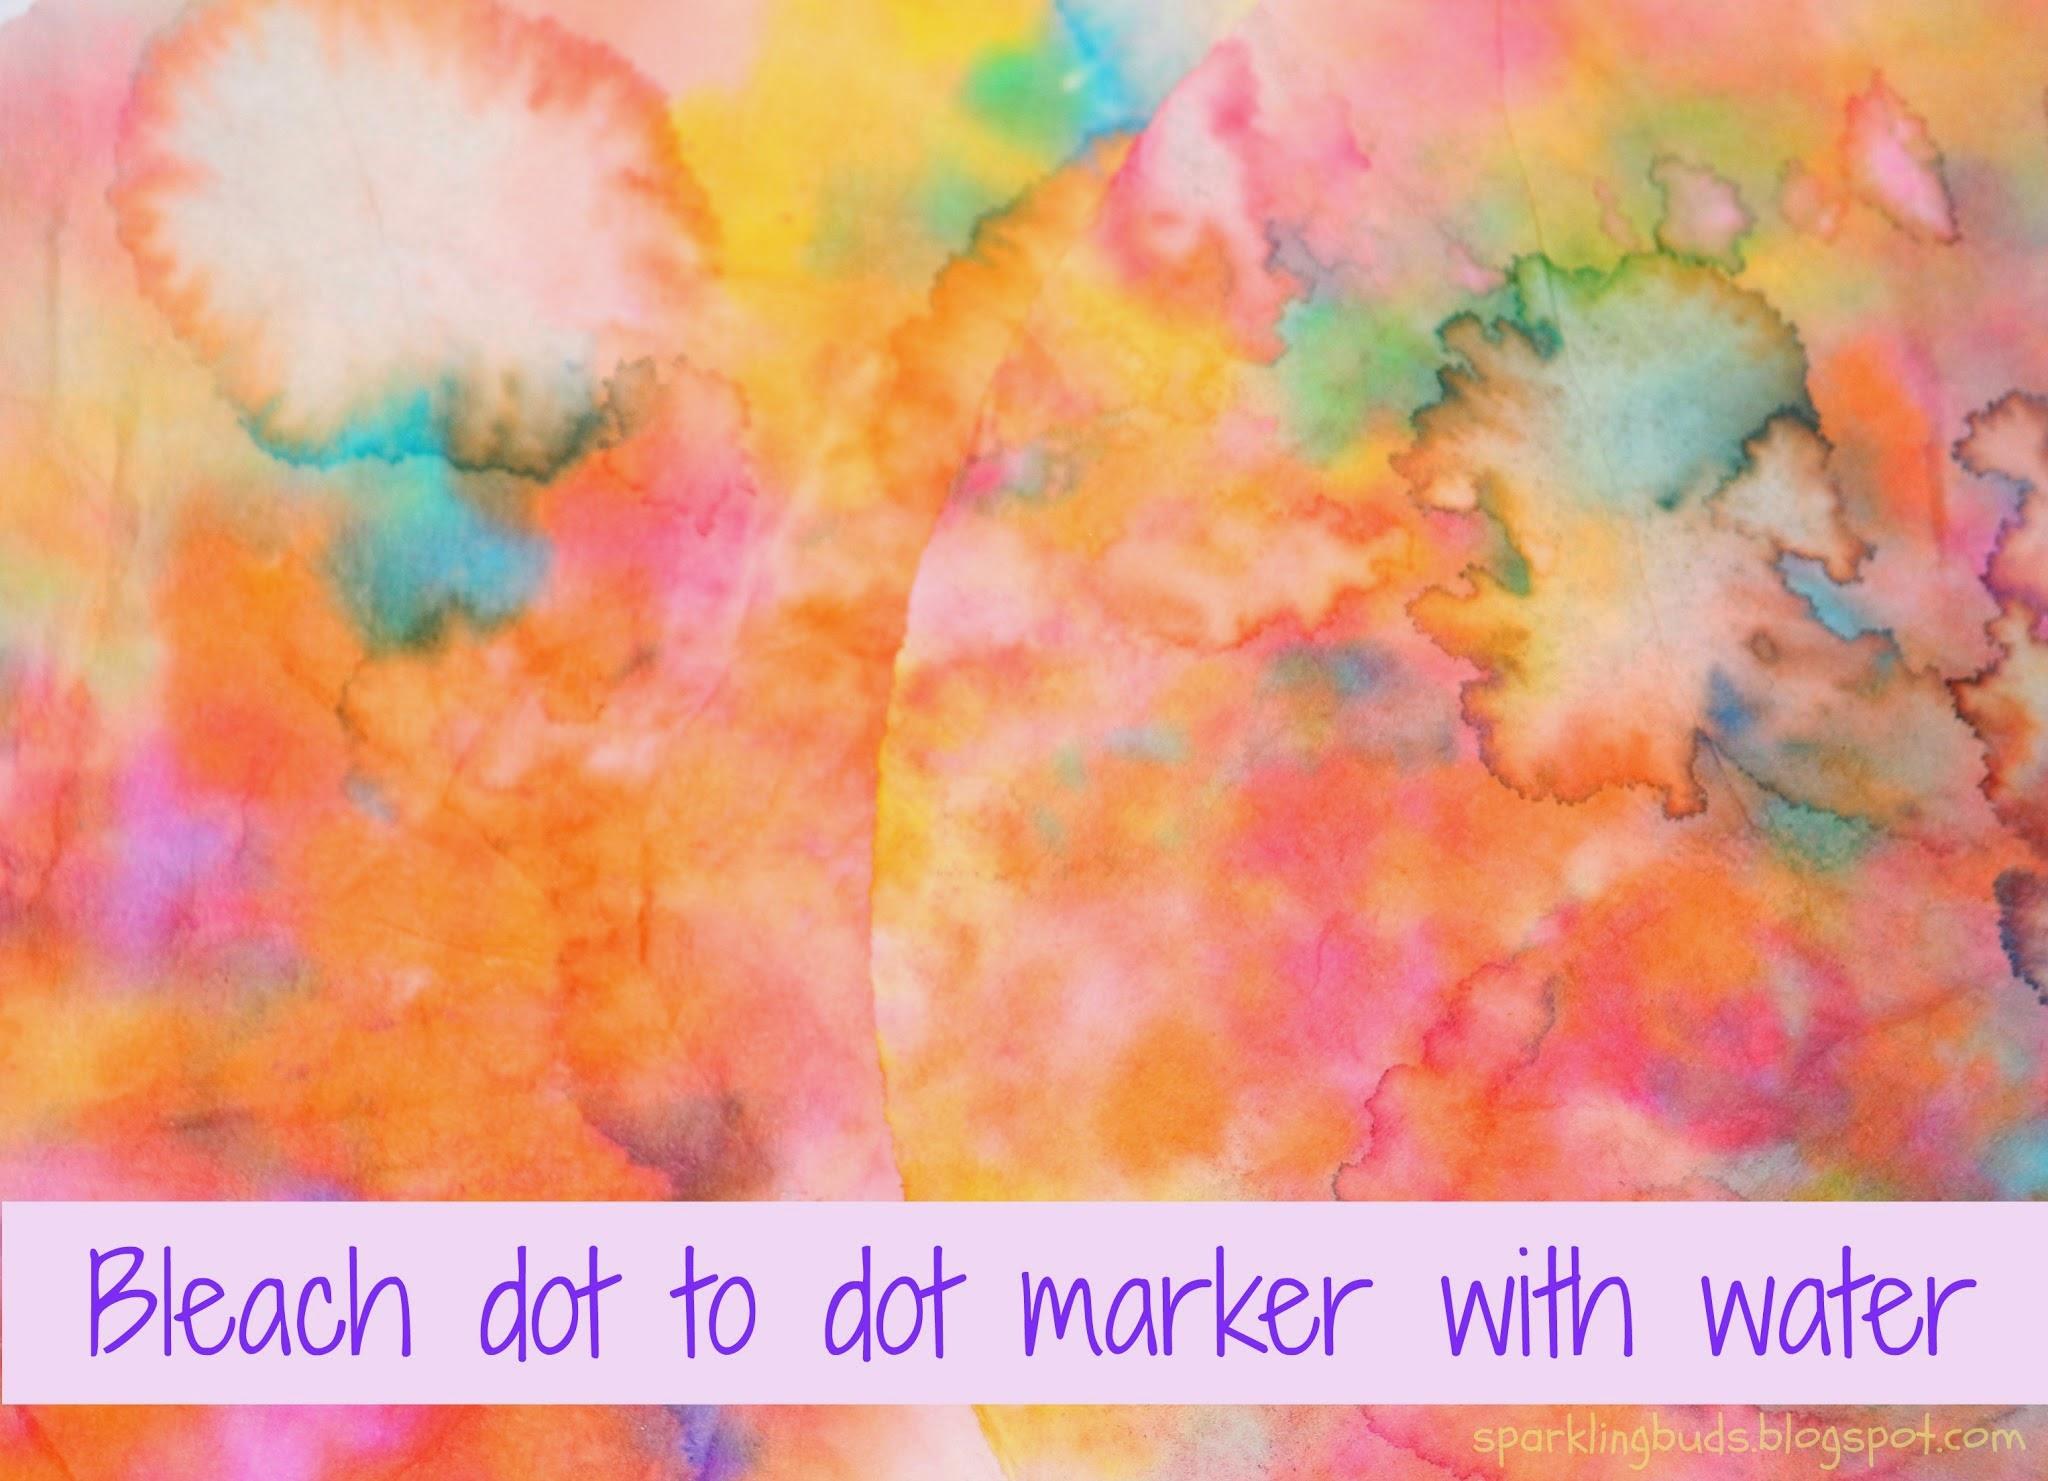 Bleach Dot To Dot Marker Paintings Sparklingbuds